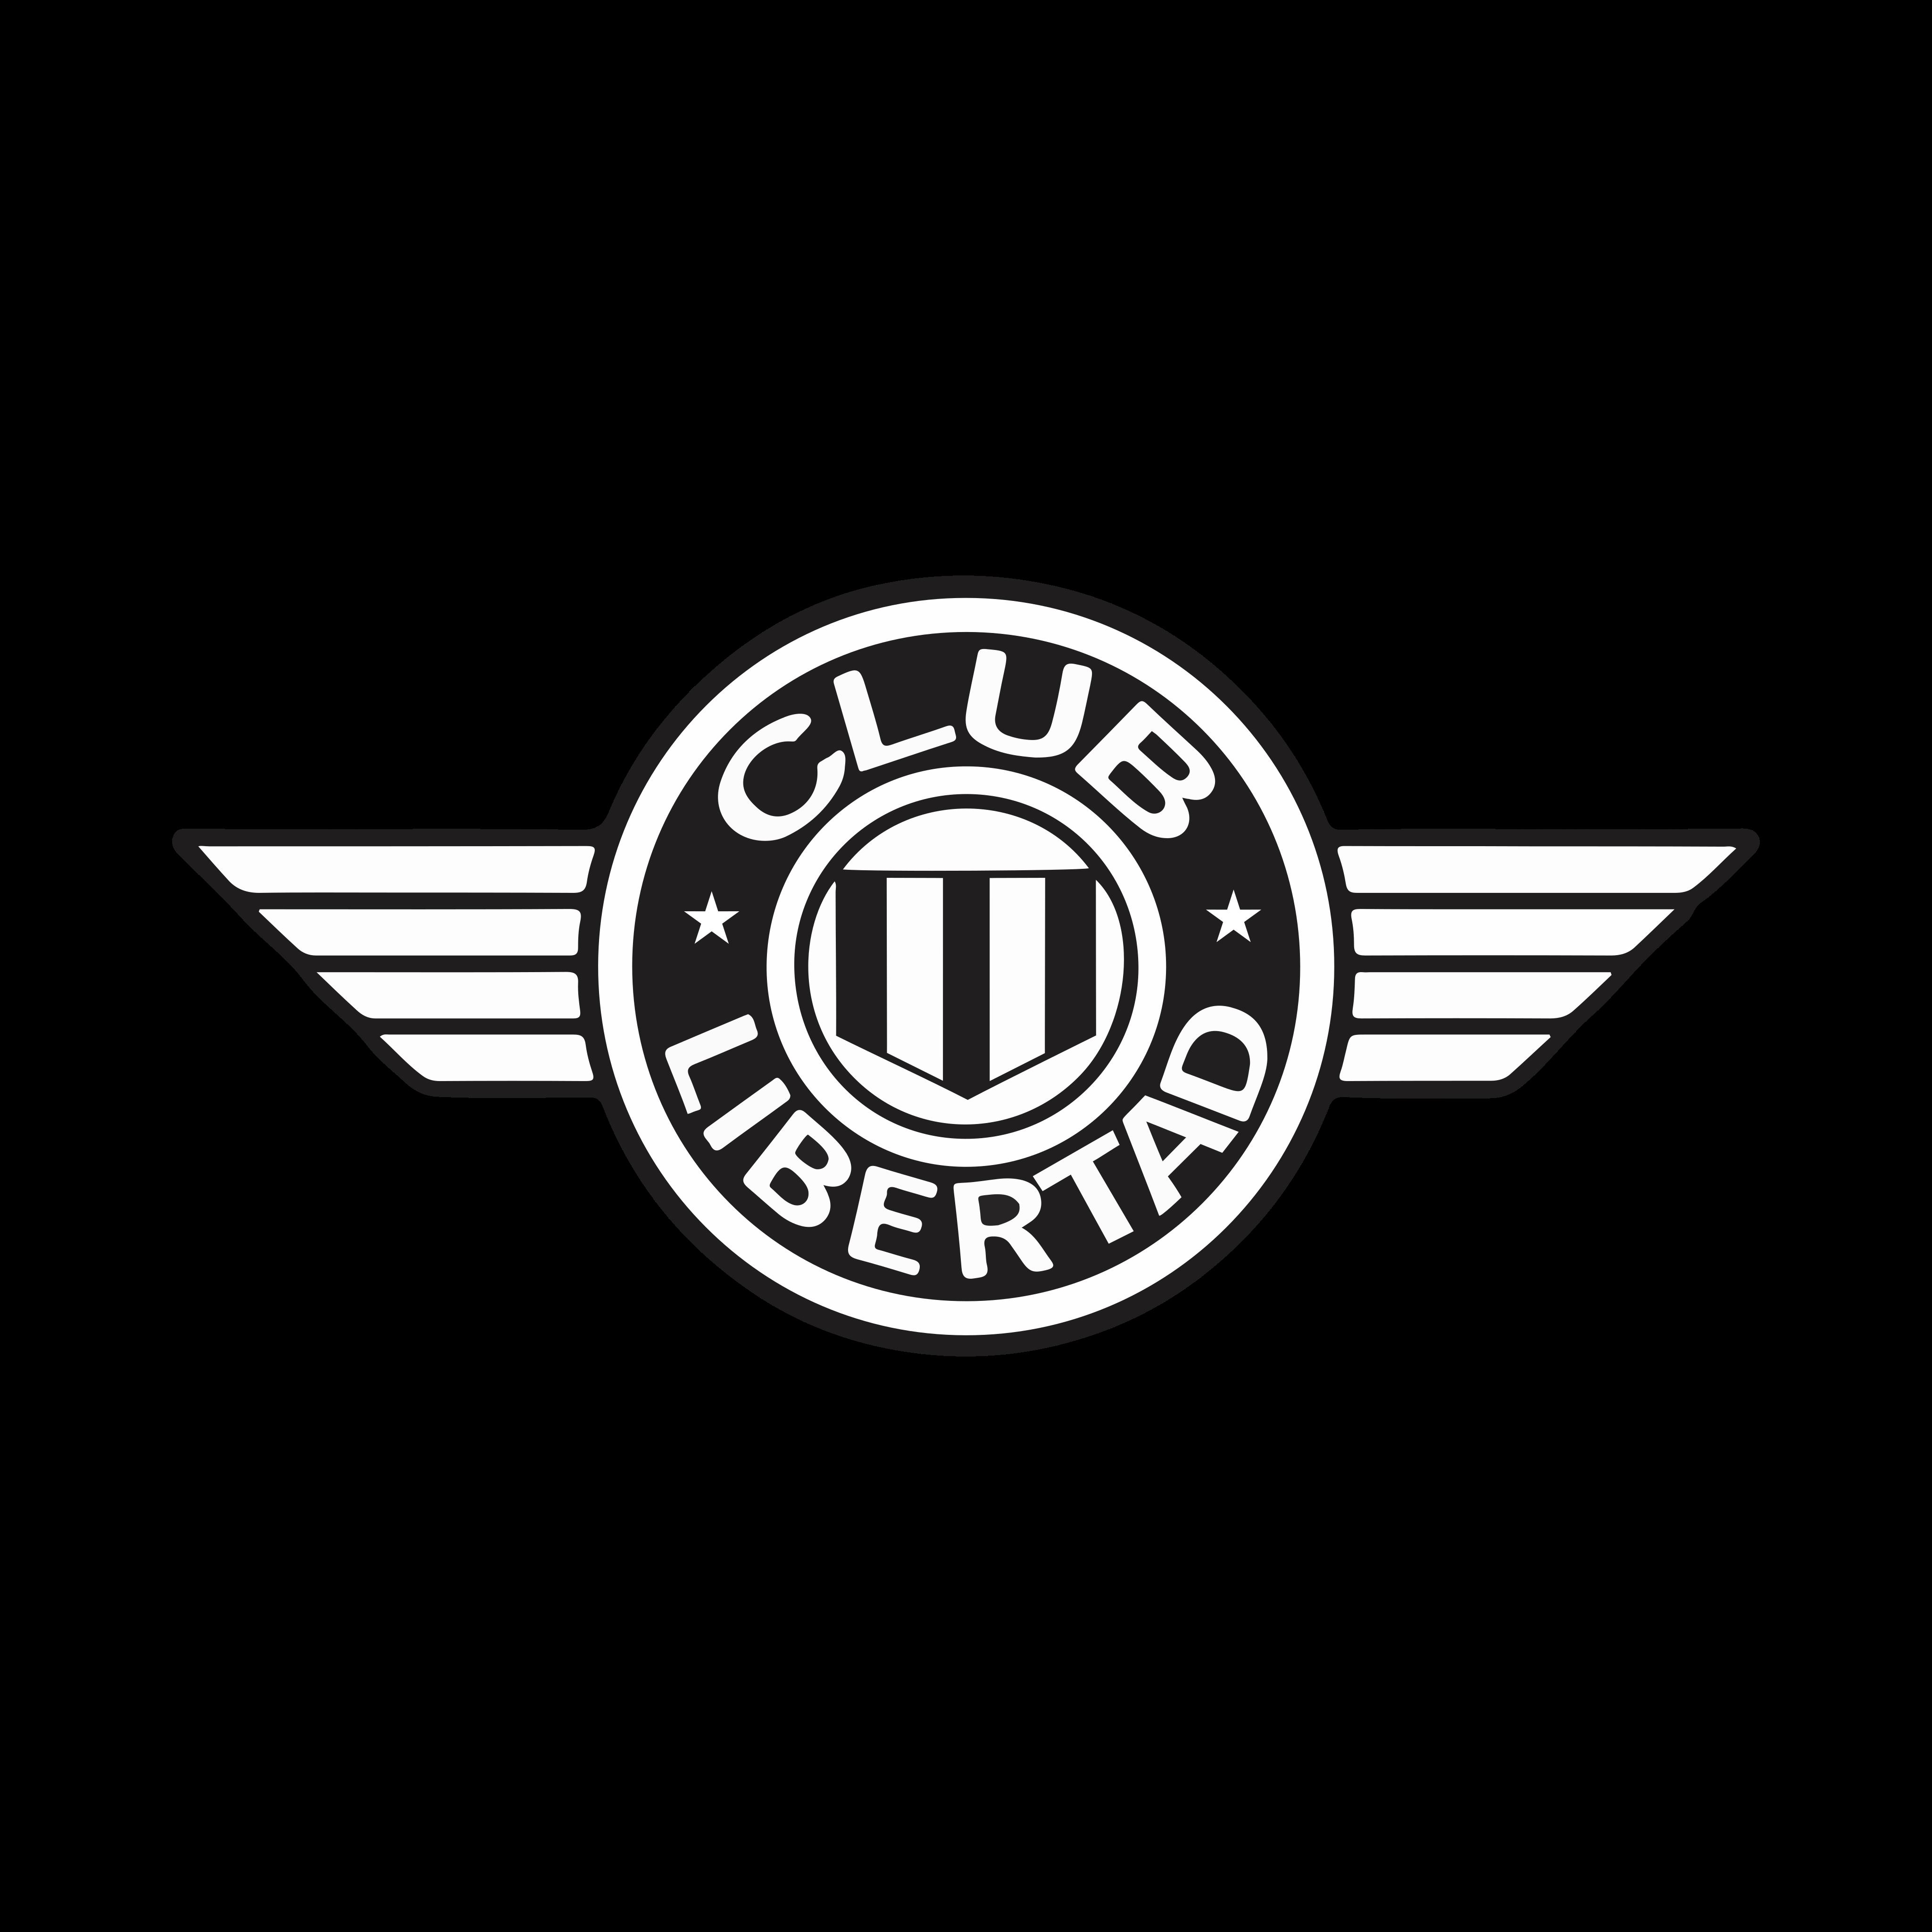 club libertad logo 0 - Club Libertad Logo